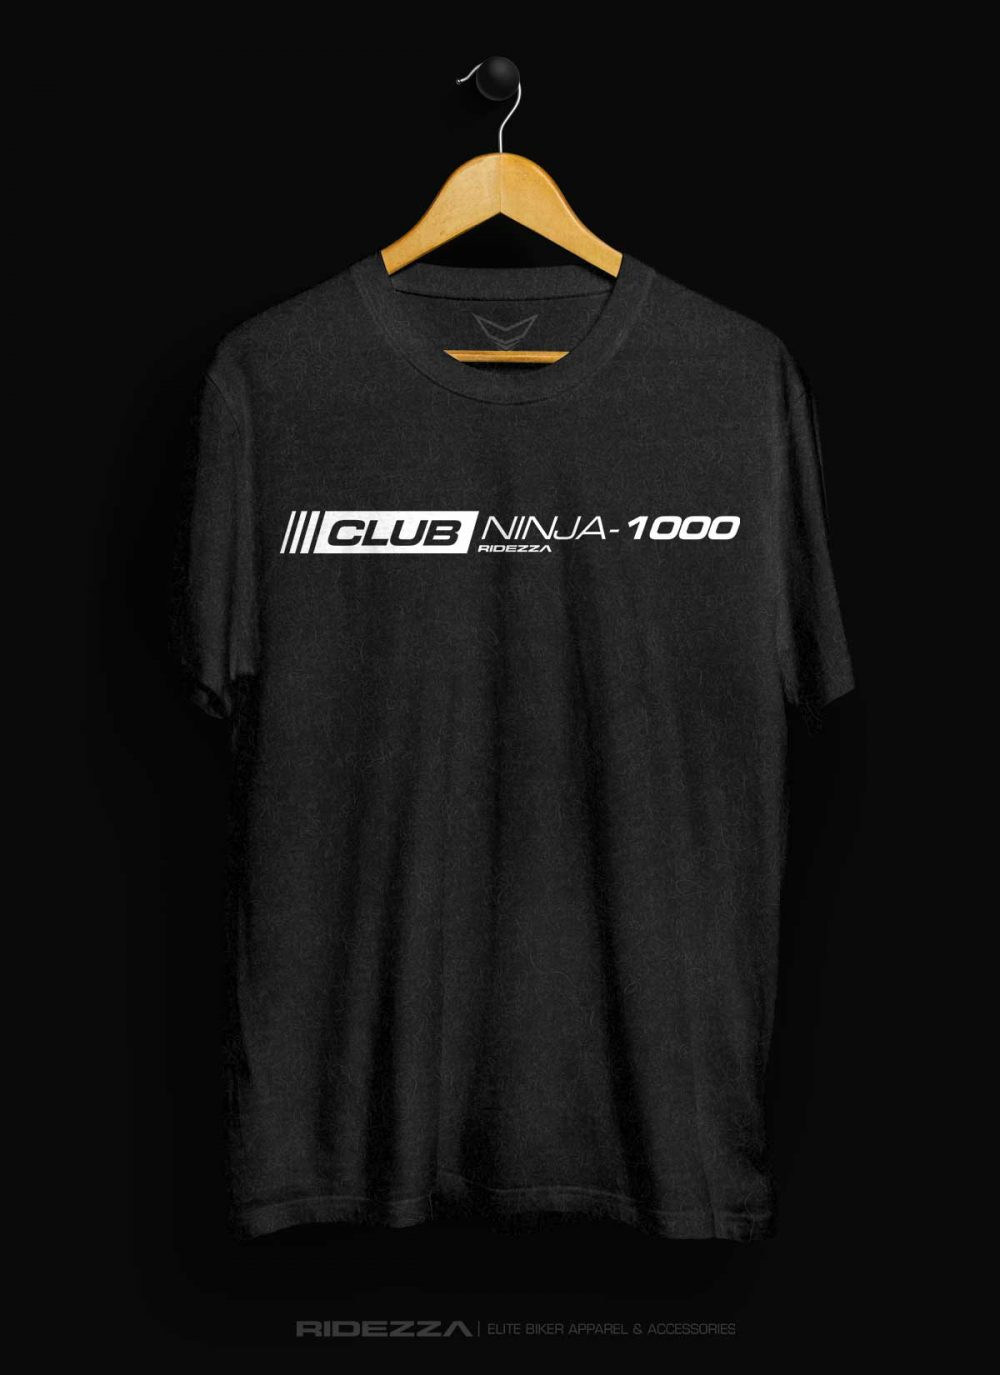 Kawasaki Ninja 1000 Club T-Shirt